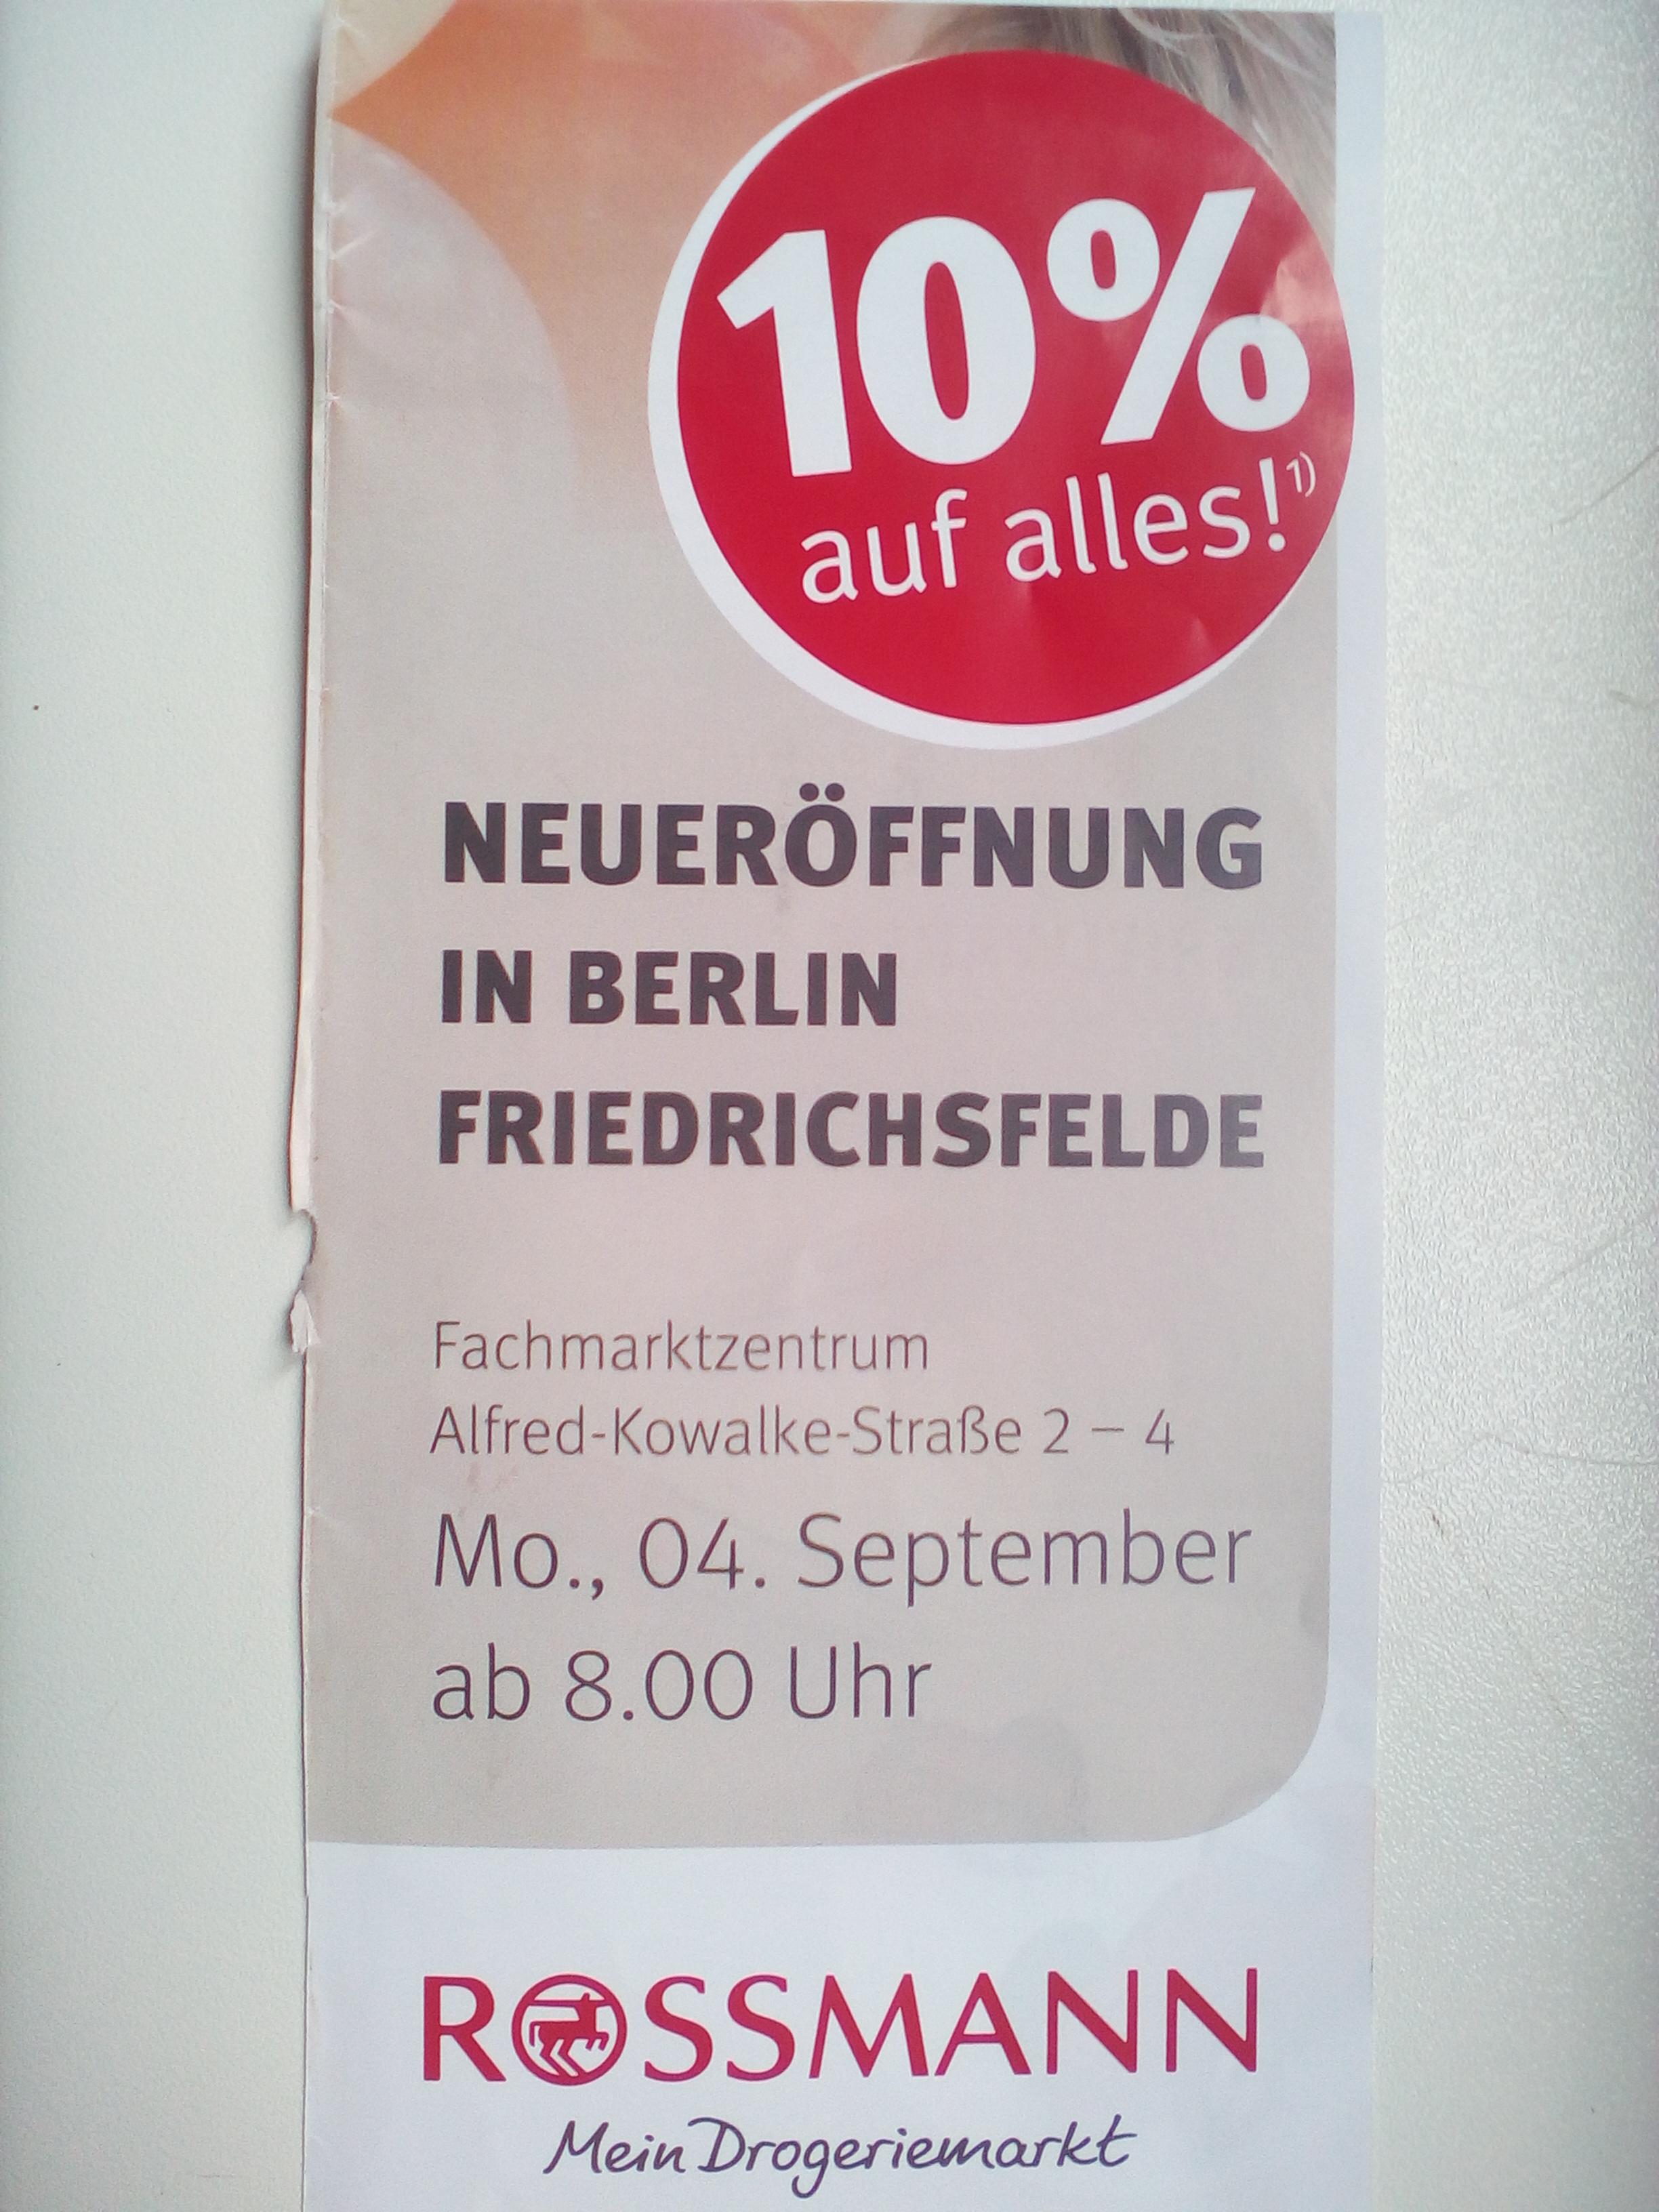 [Lokal Berlin Friedrichsfelde Rossmann 4.9-9.9.2017] 10% auf Alles, gratis Cremeseife, 5 gratis Fotos